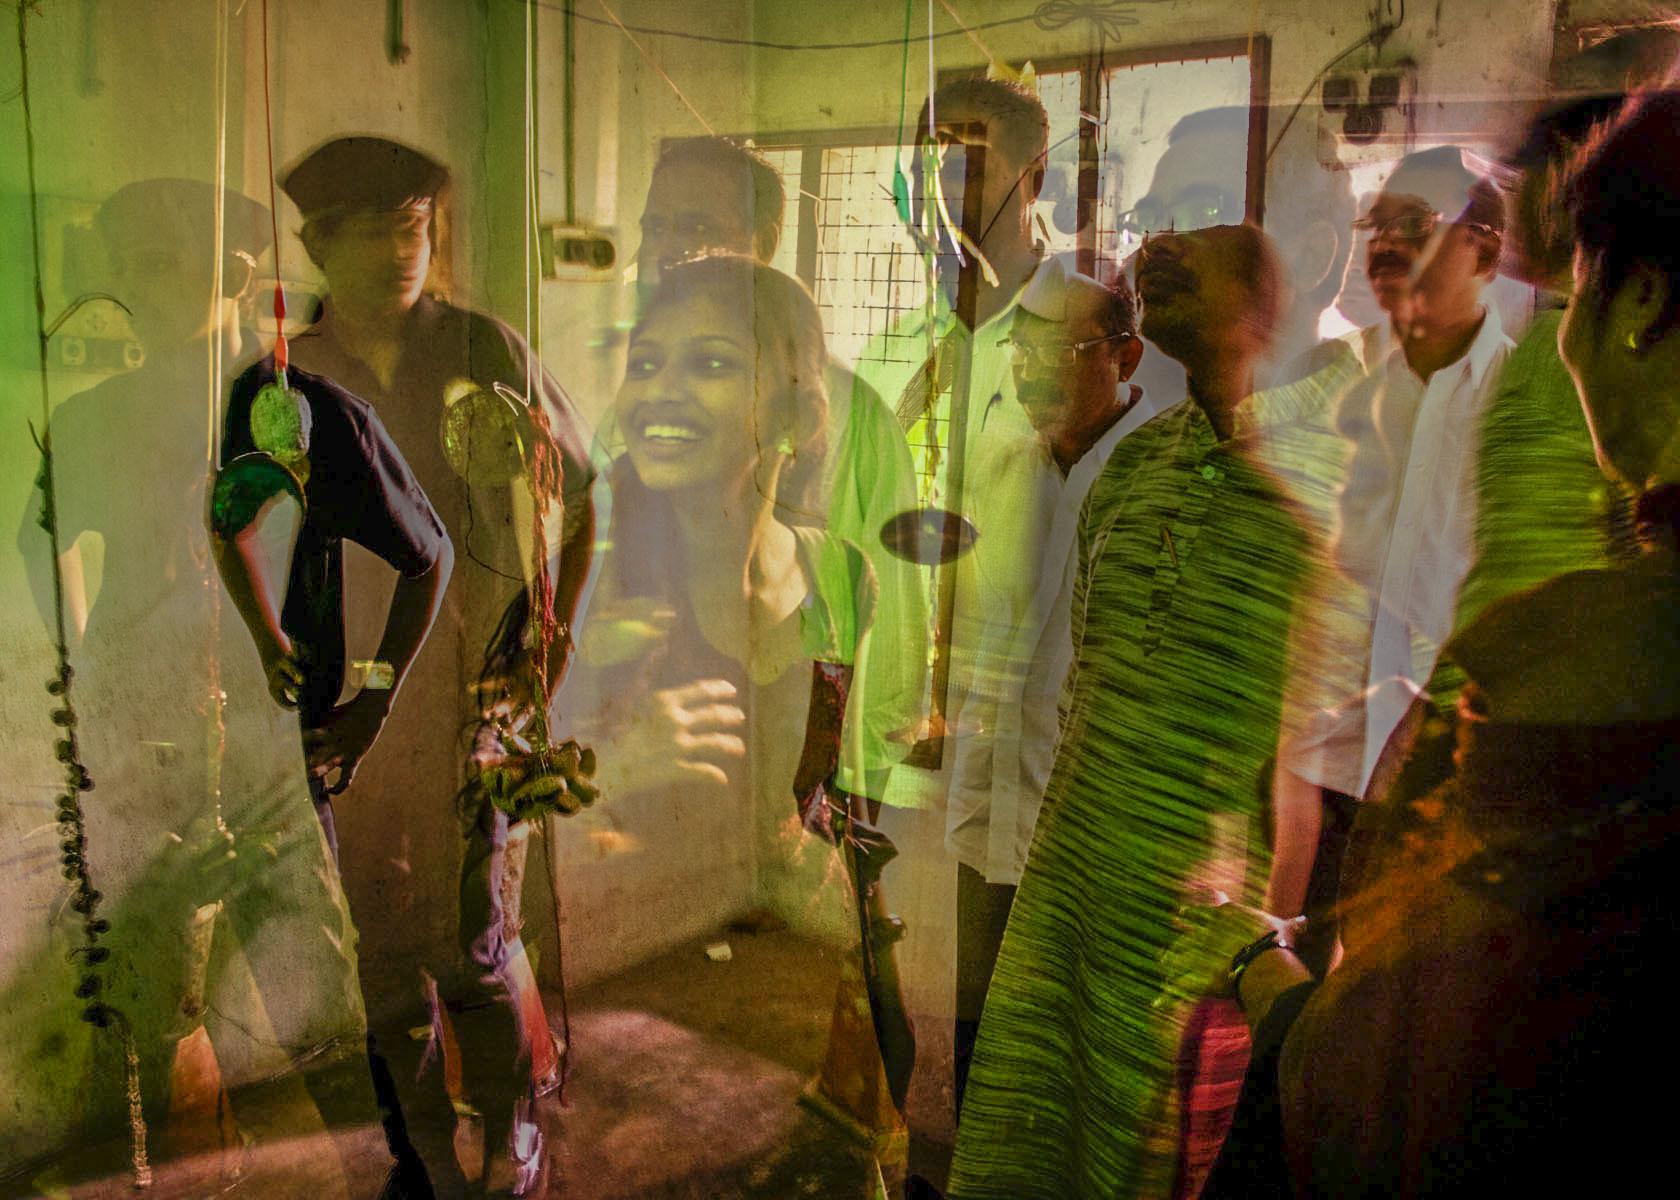 Kochi Muziris Biennale| Fort Kochi, India